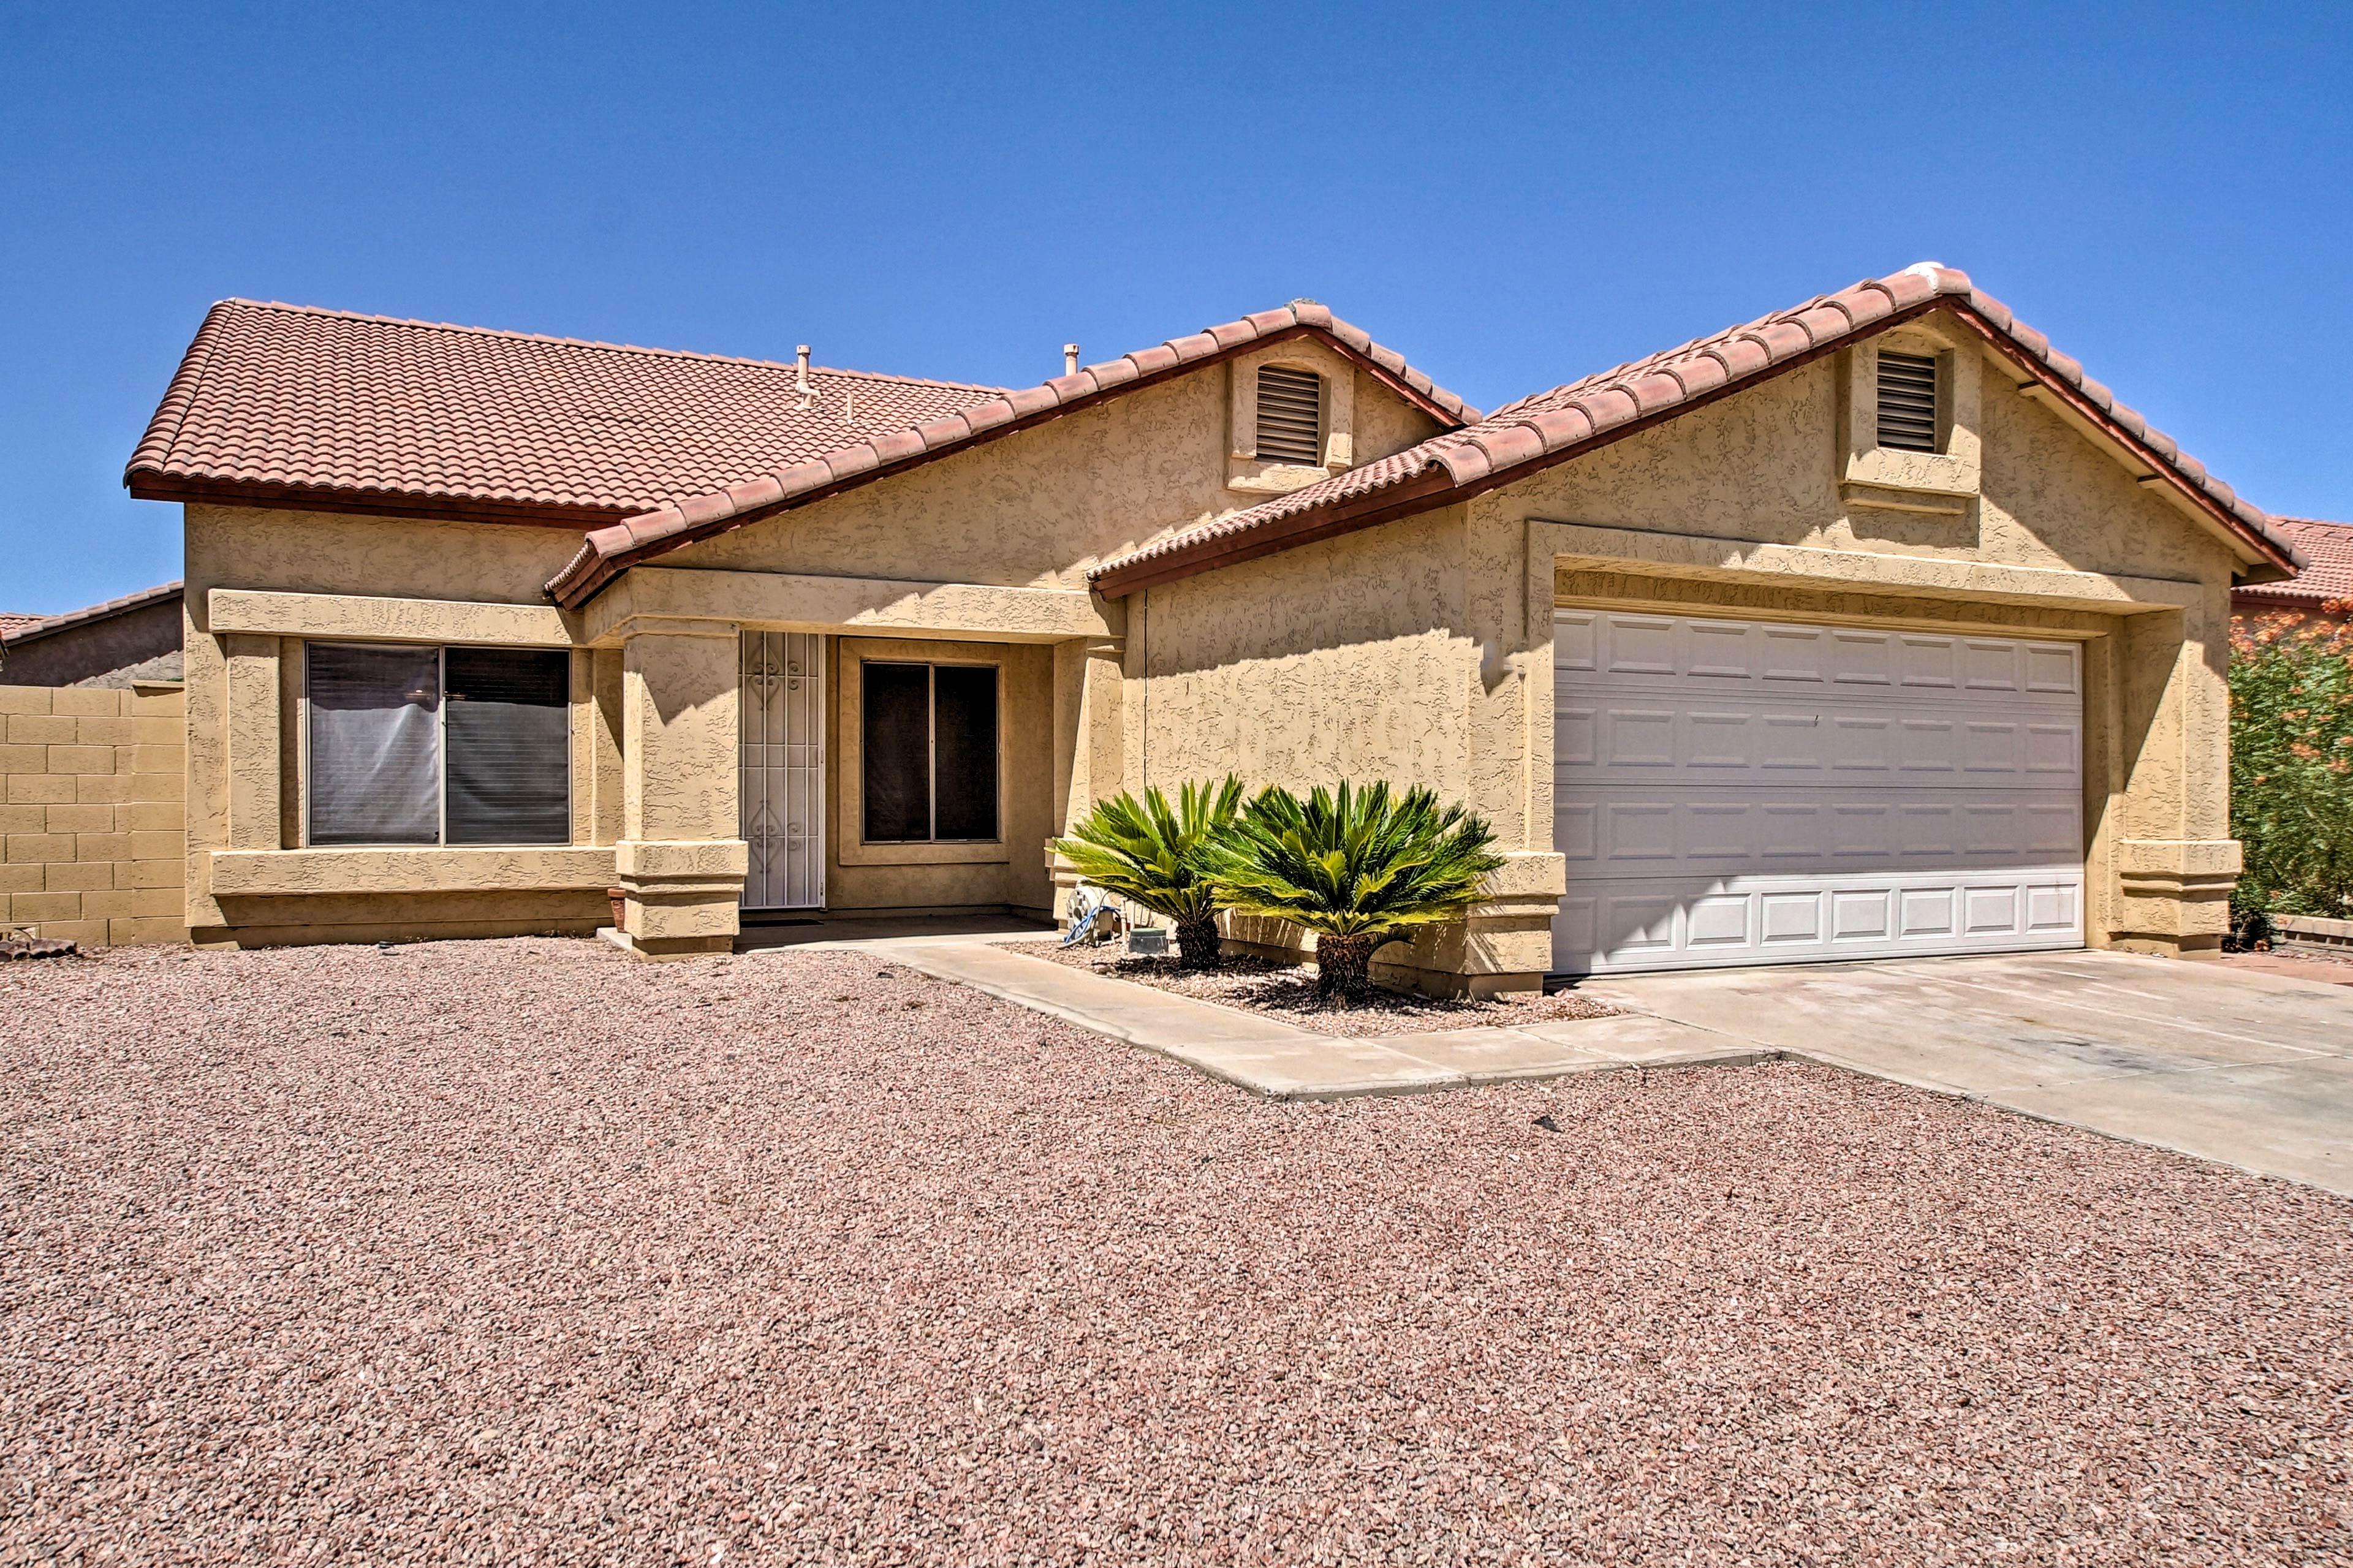 Book your Glendale getaway to this spacious 4-bedroom, 2-bathroom desert abode!